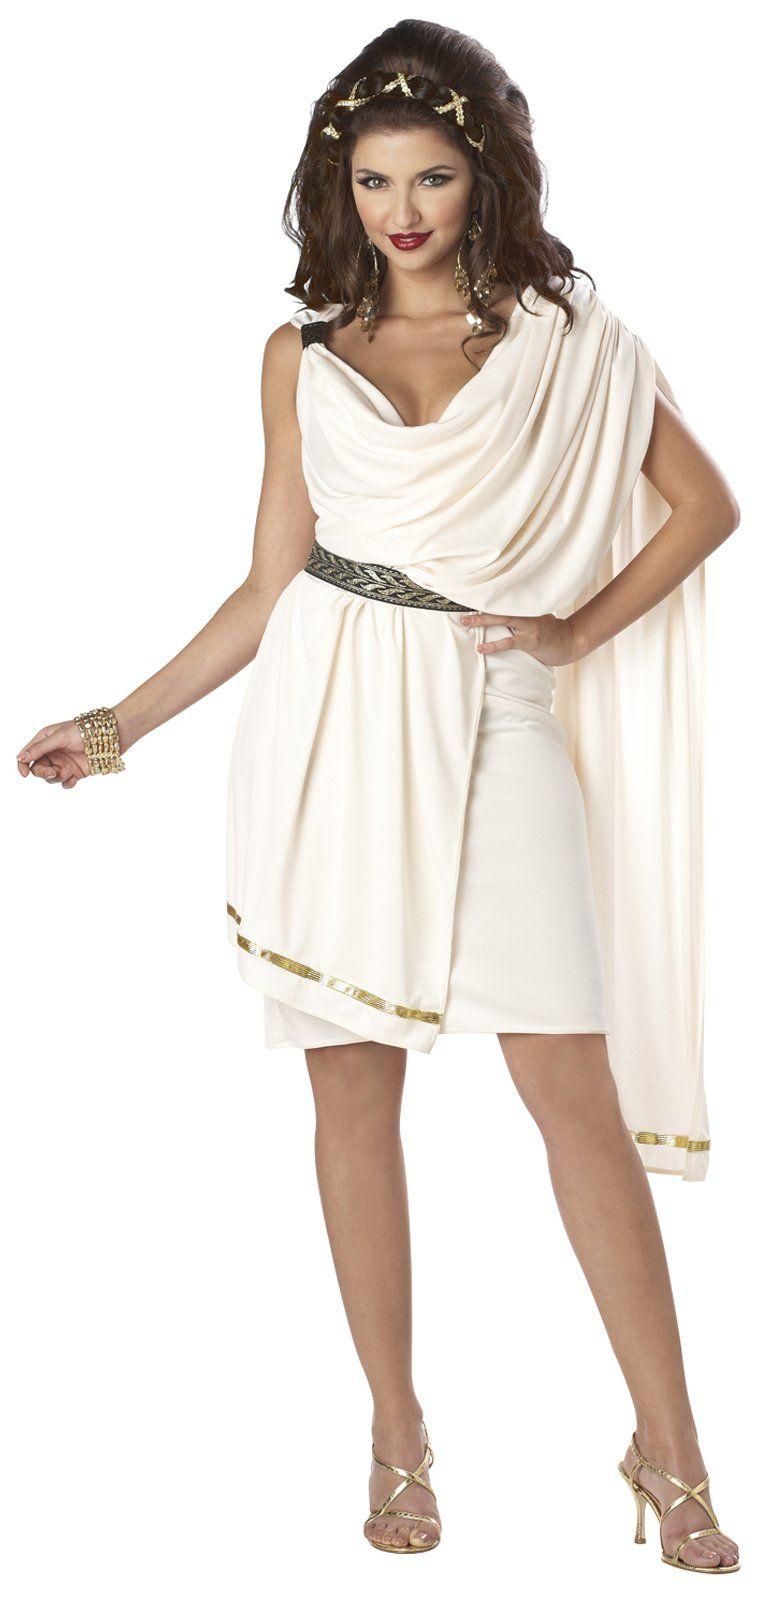 Deluxe classic toga female adult costume toga costume deluxe classic toga female adult costume solutioingenieria Images